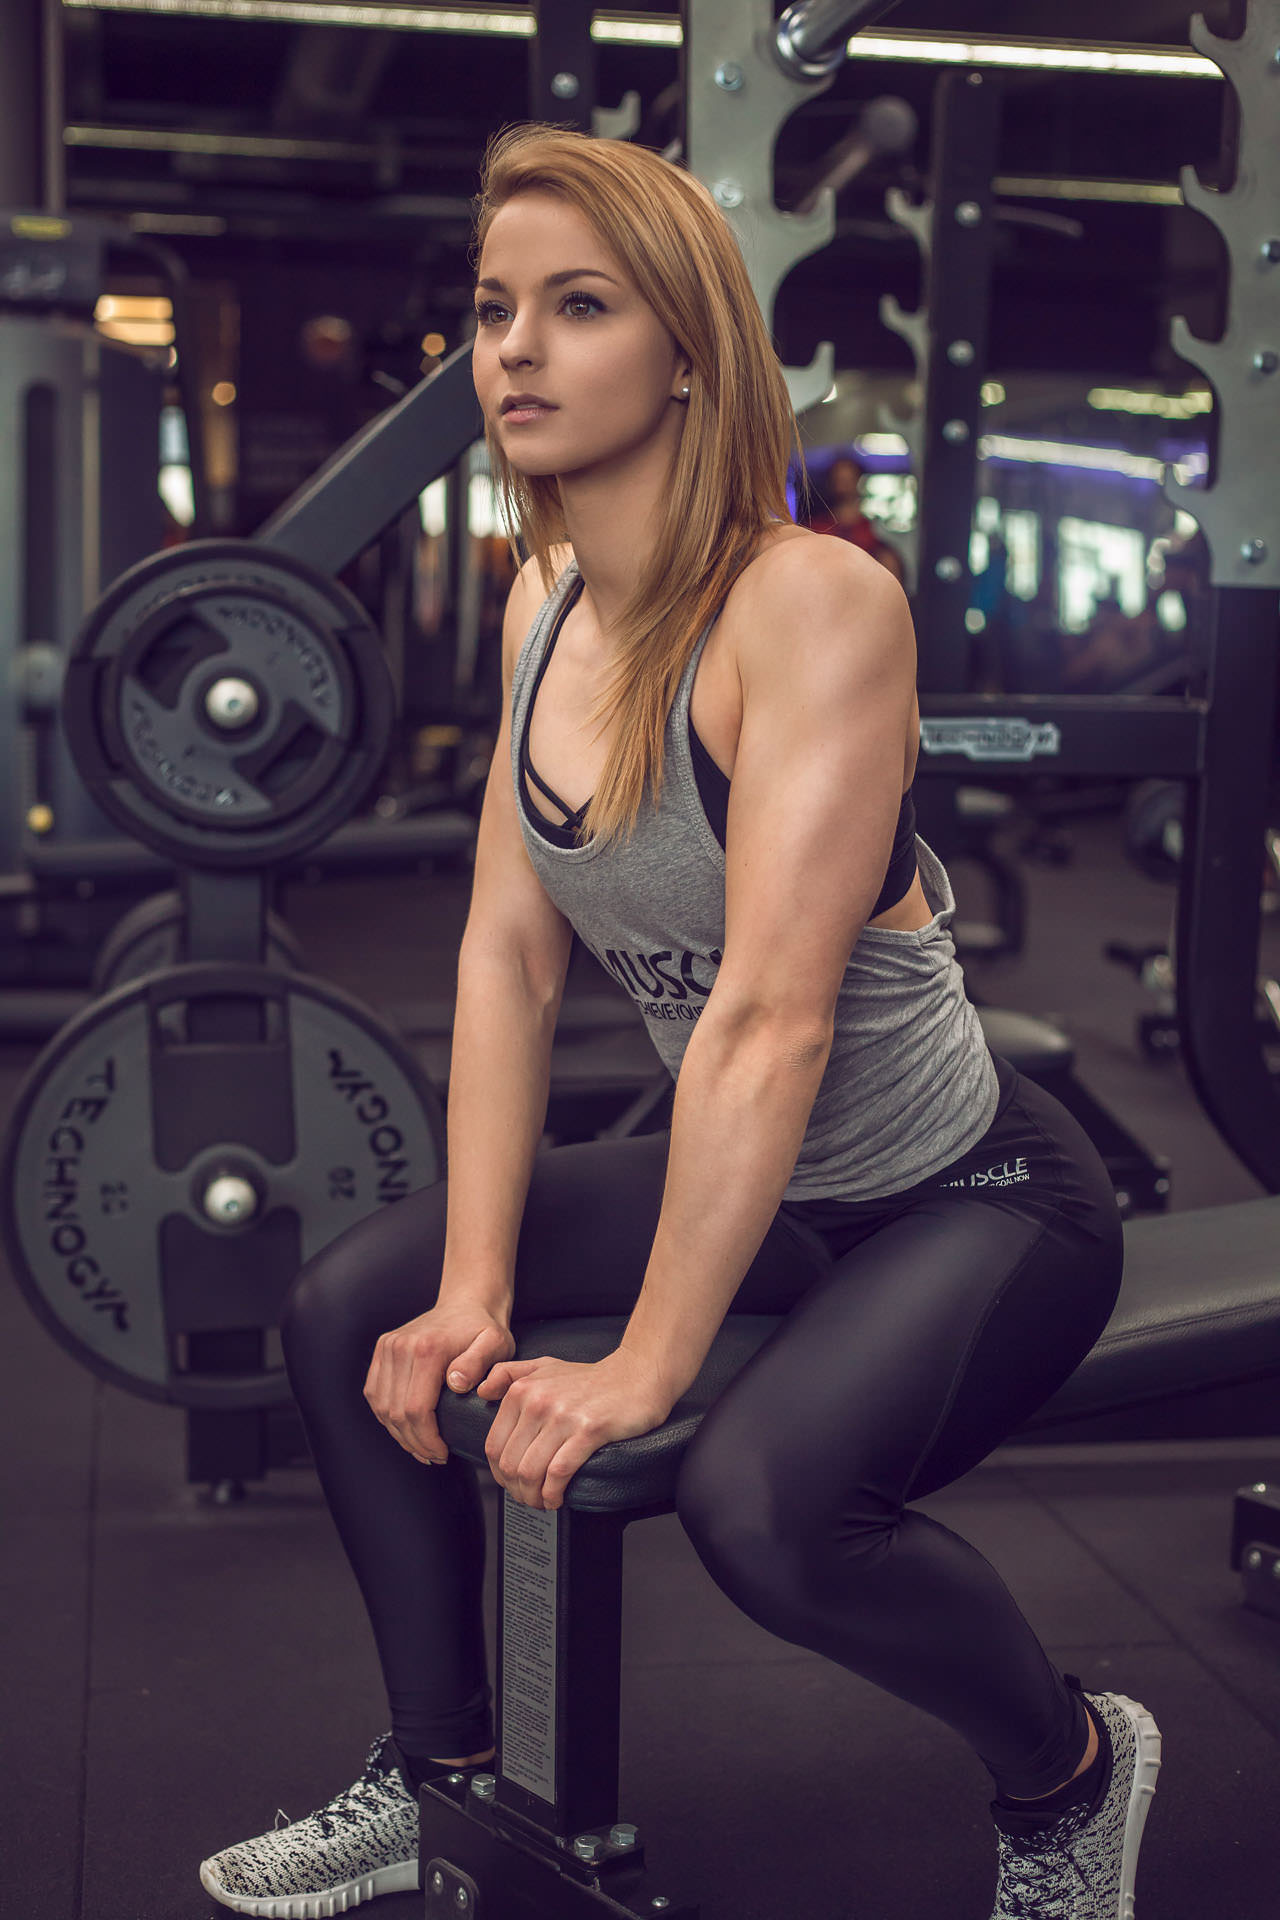 2017-02-24 - Stessie LittleBirds - MyMuscle - FitnessPark - 3191 - 1920px